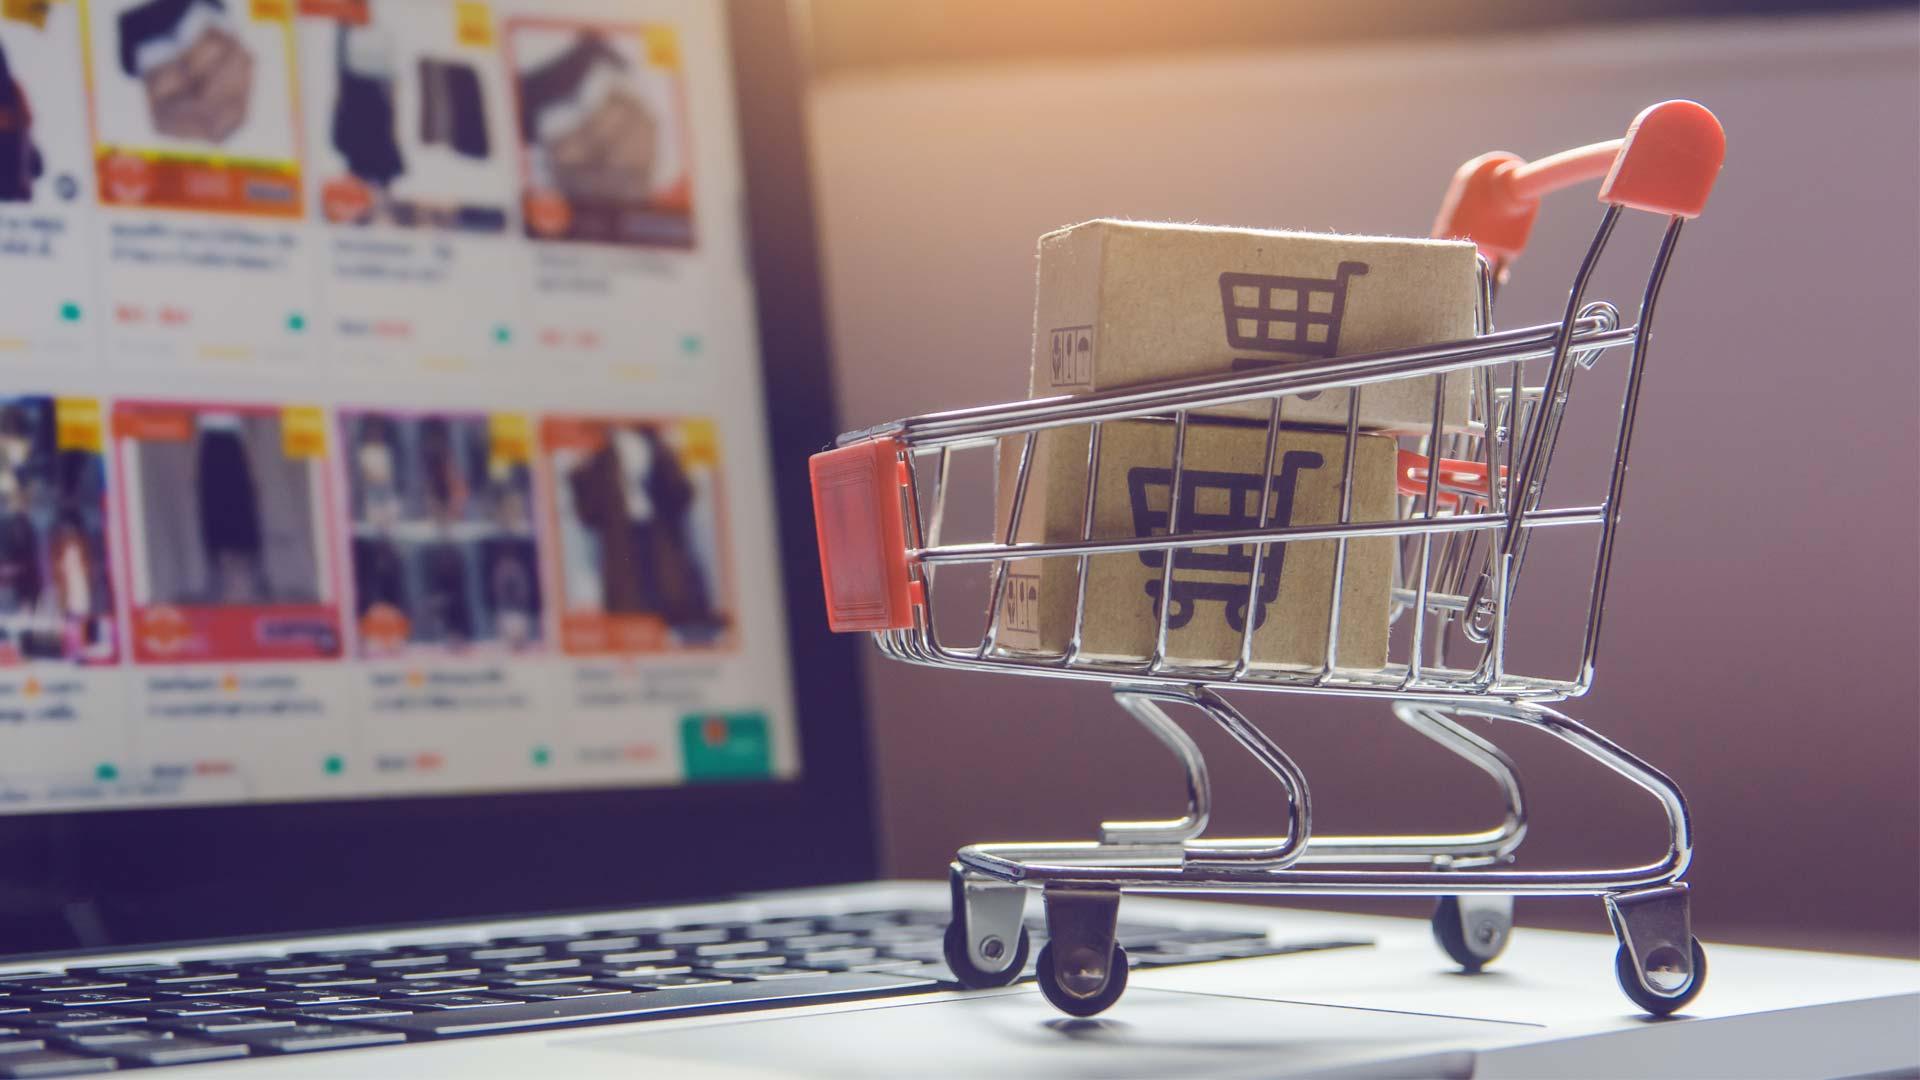 Strategic Sourcing Online Shopping Image